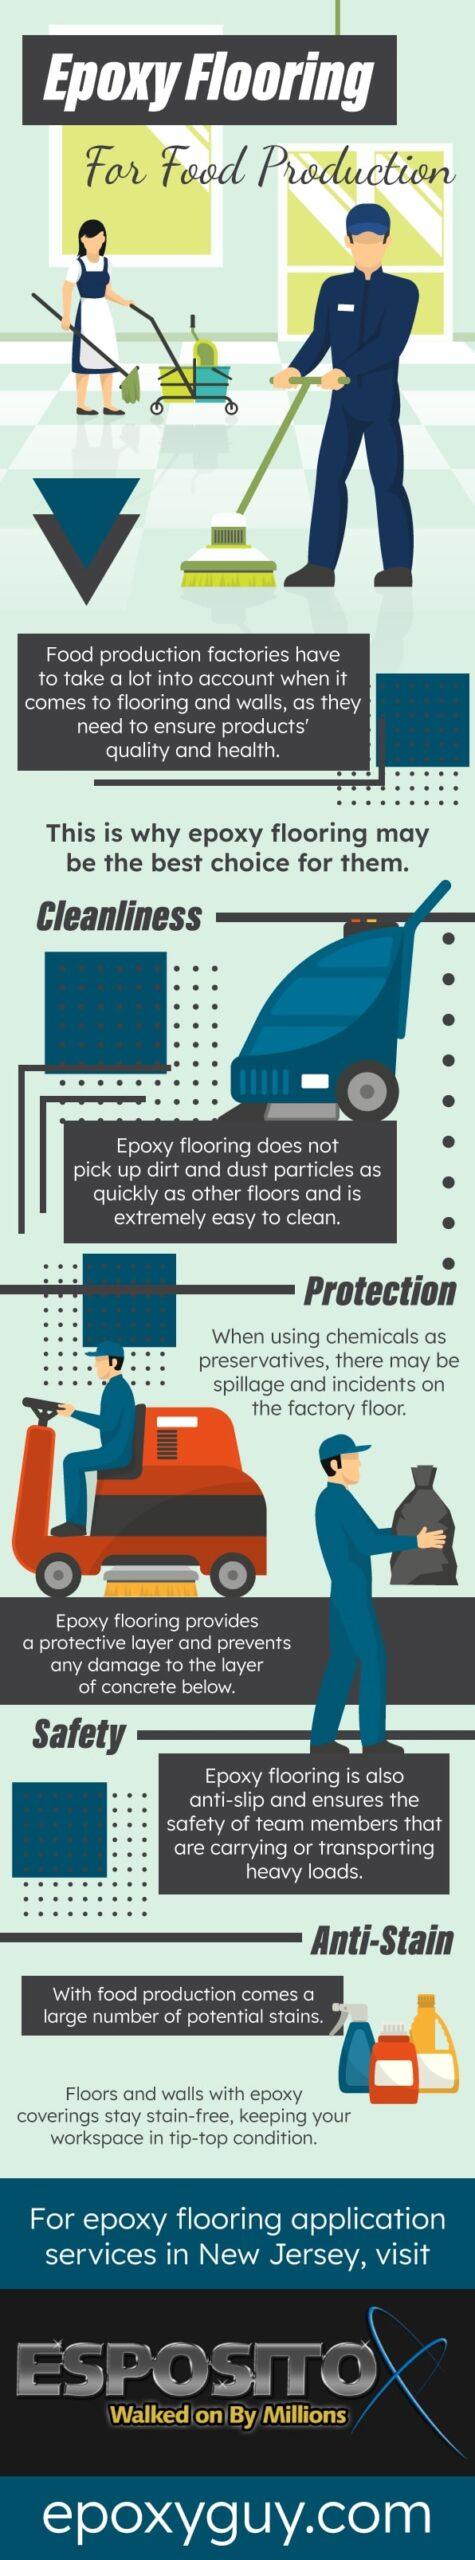 Epoxy floor for food production